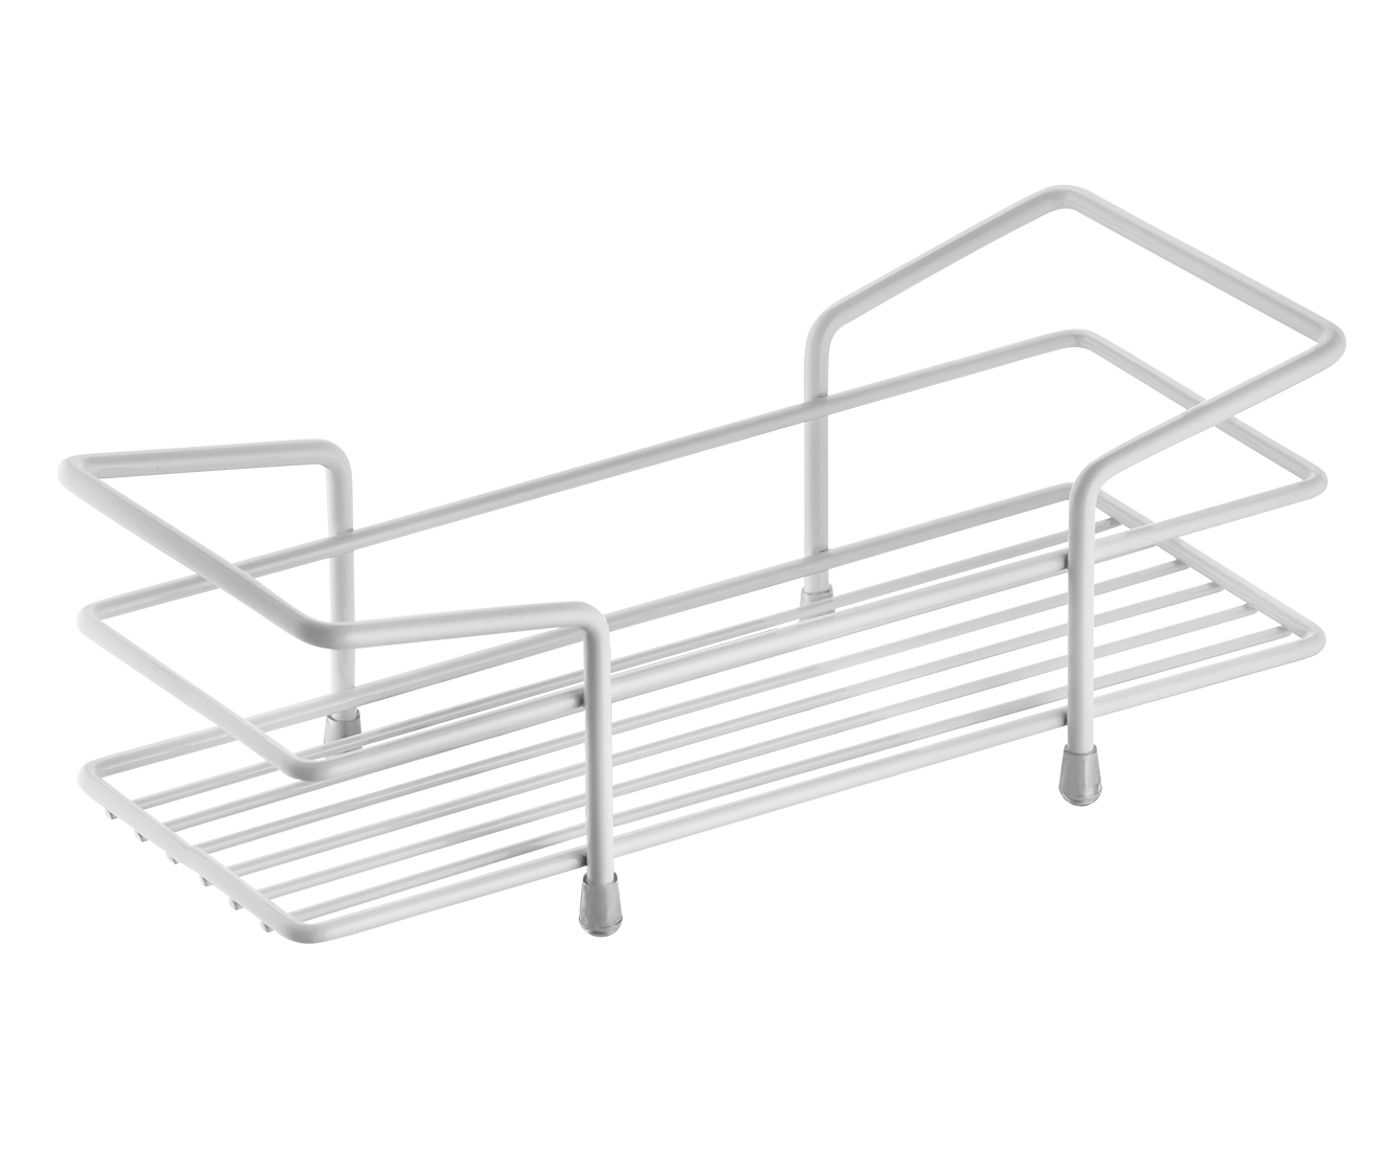 Organizador de Bancada Dry Branco - 29X11X11,5cm | Westwing.com.br